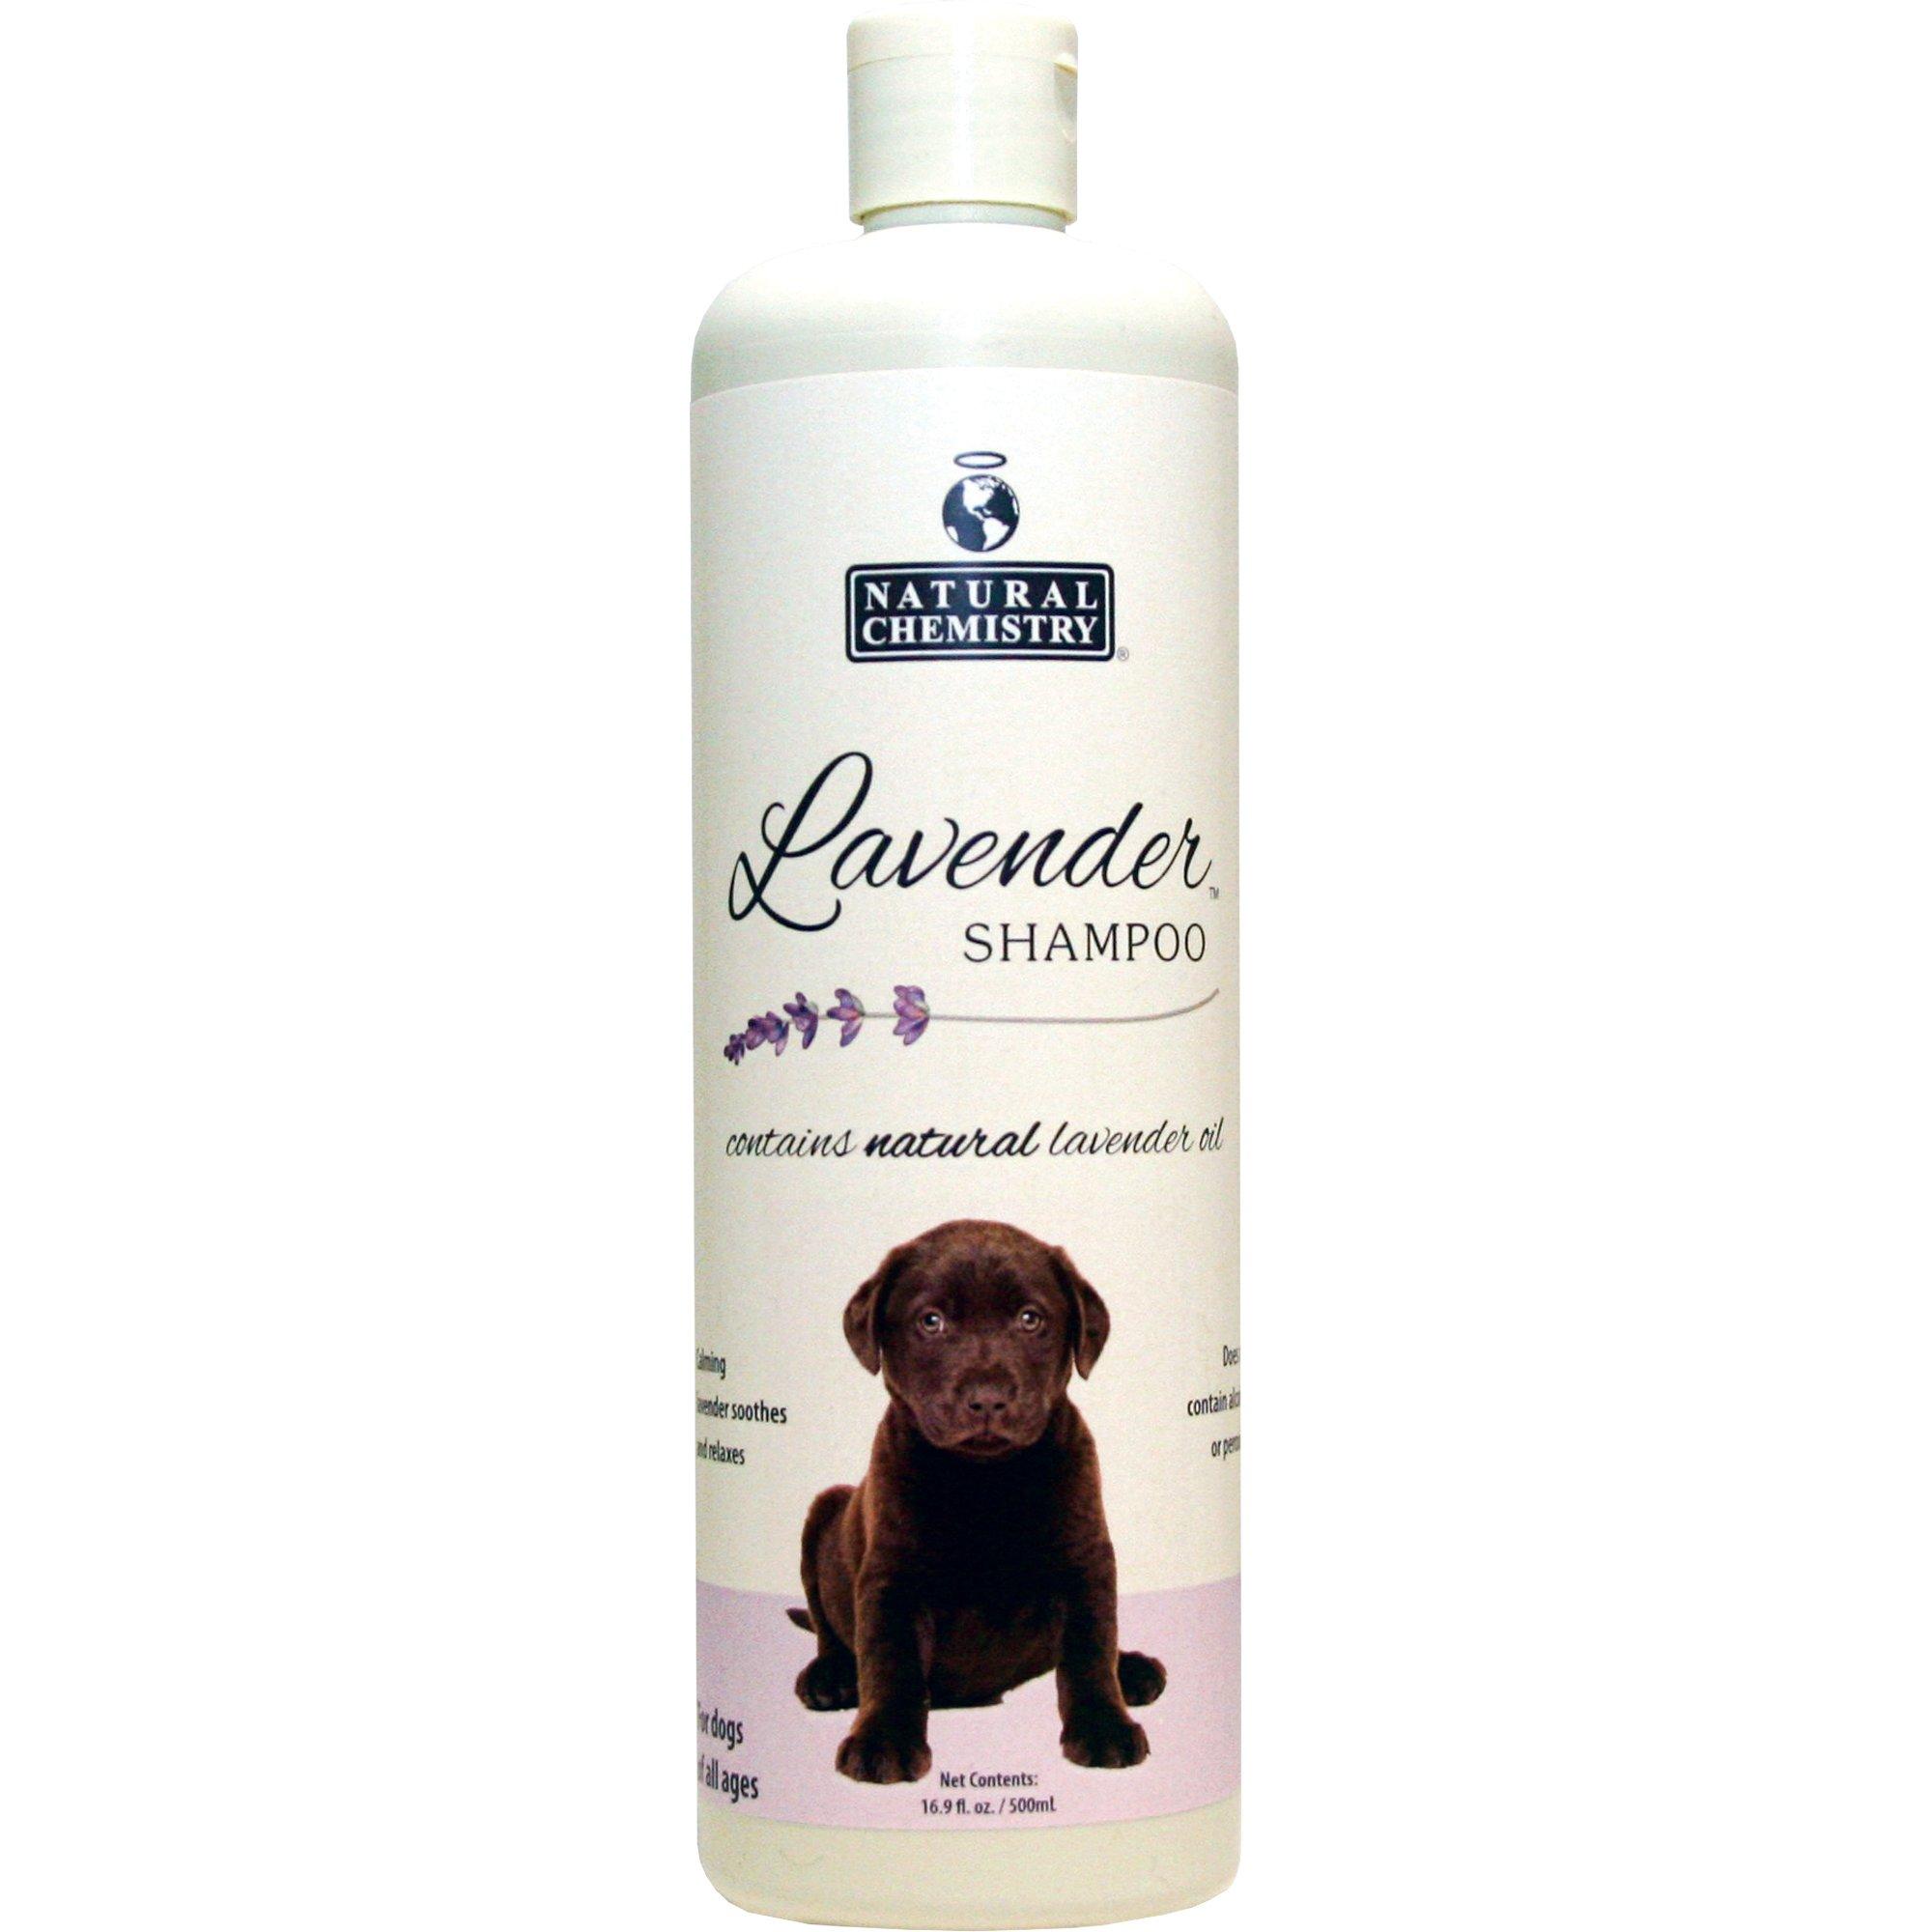 Natural Chemistry Lavender Shampoo